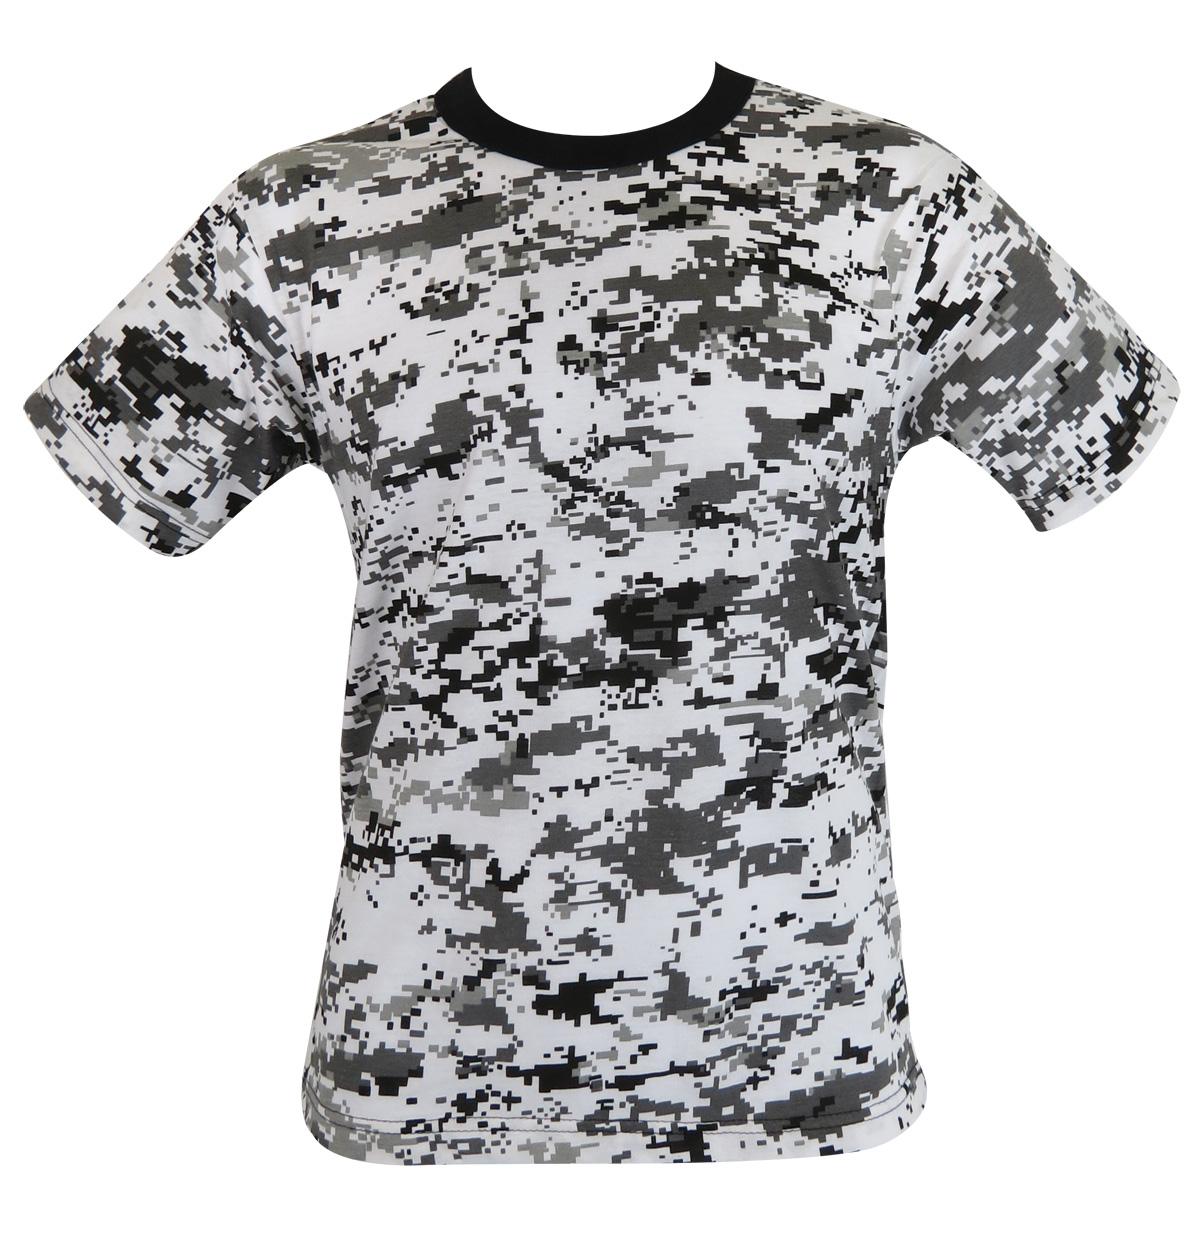 fd5c1f21 Digital City Camo T-Shirt. Tap to expand